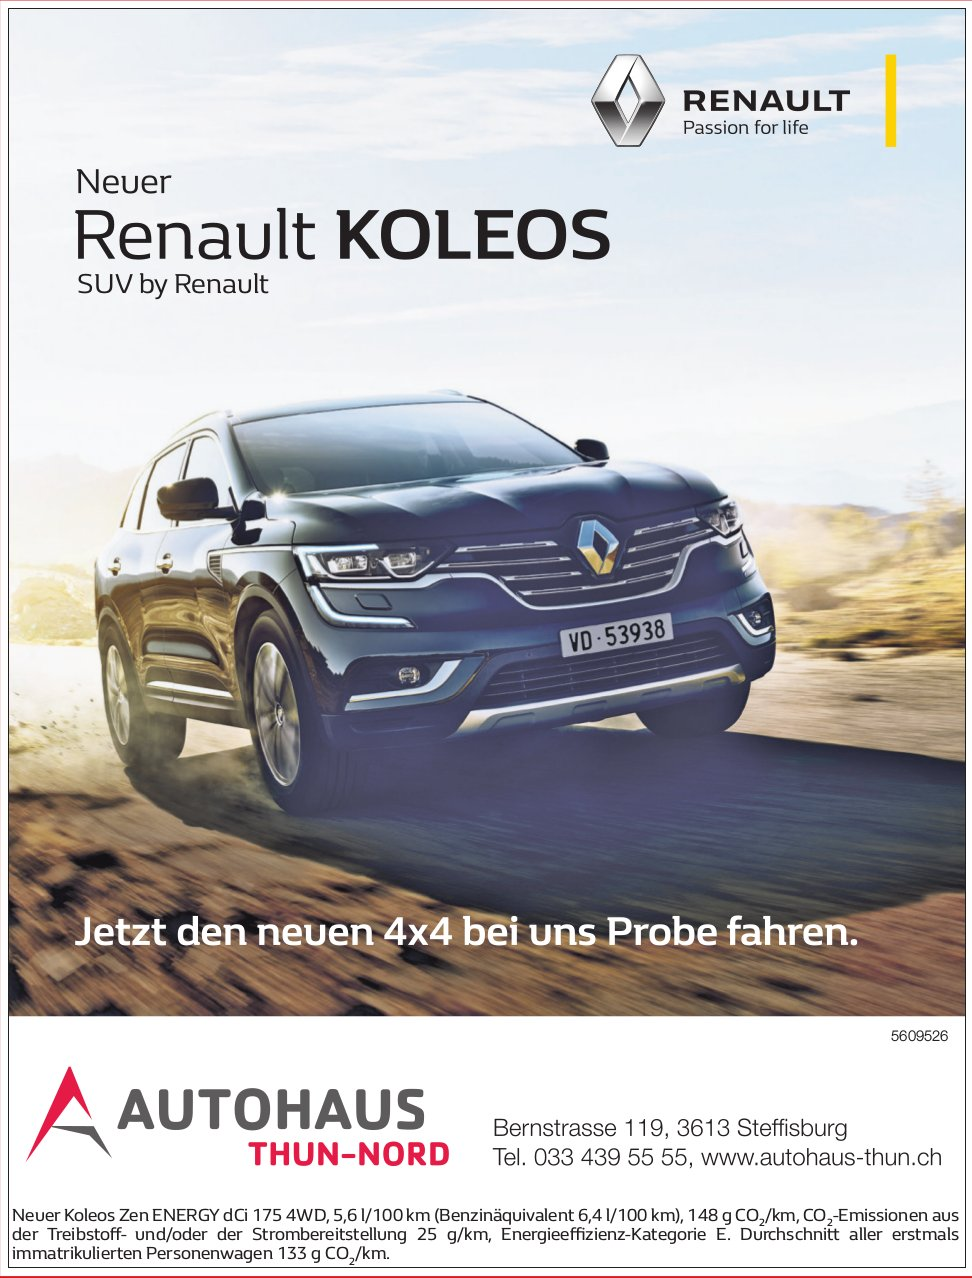 Autohaus Thun-Nord - Neuer Renault Koleos, SUV by Renault